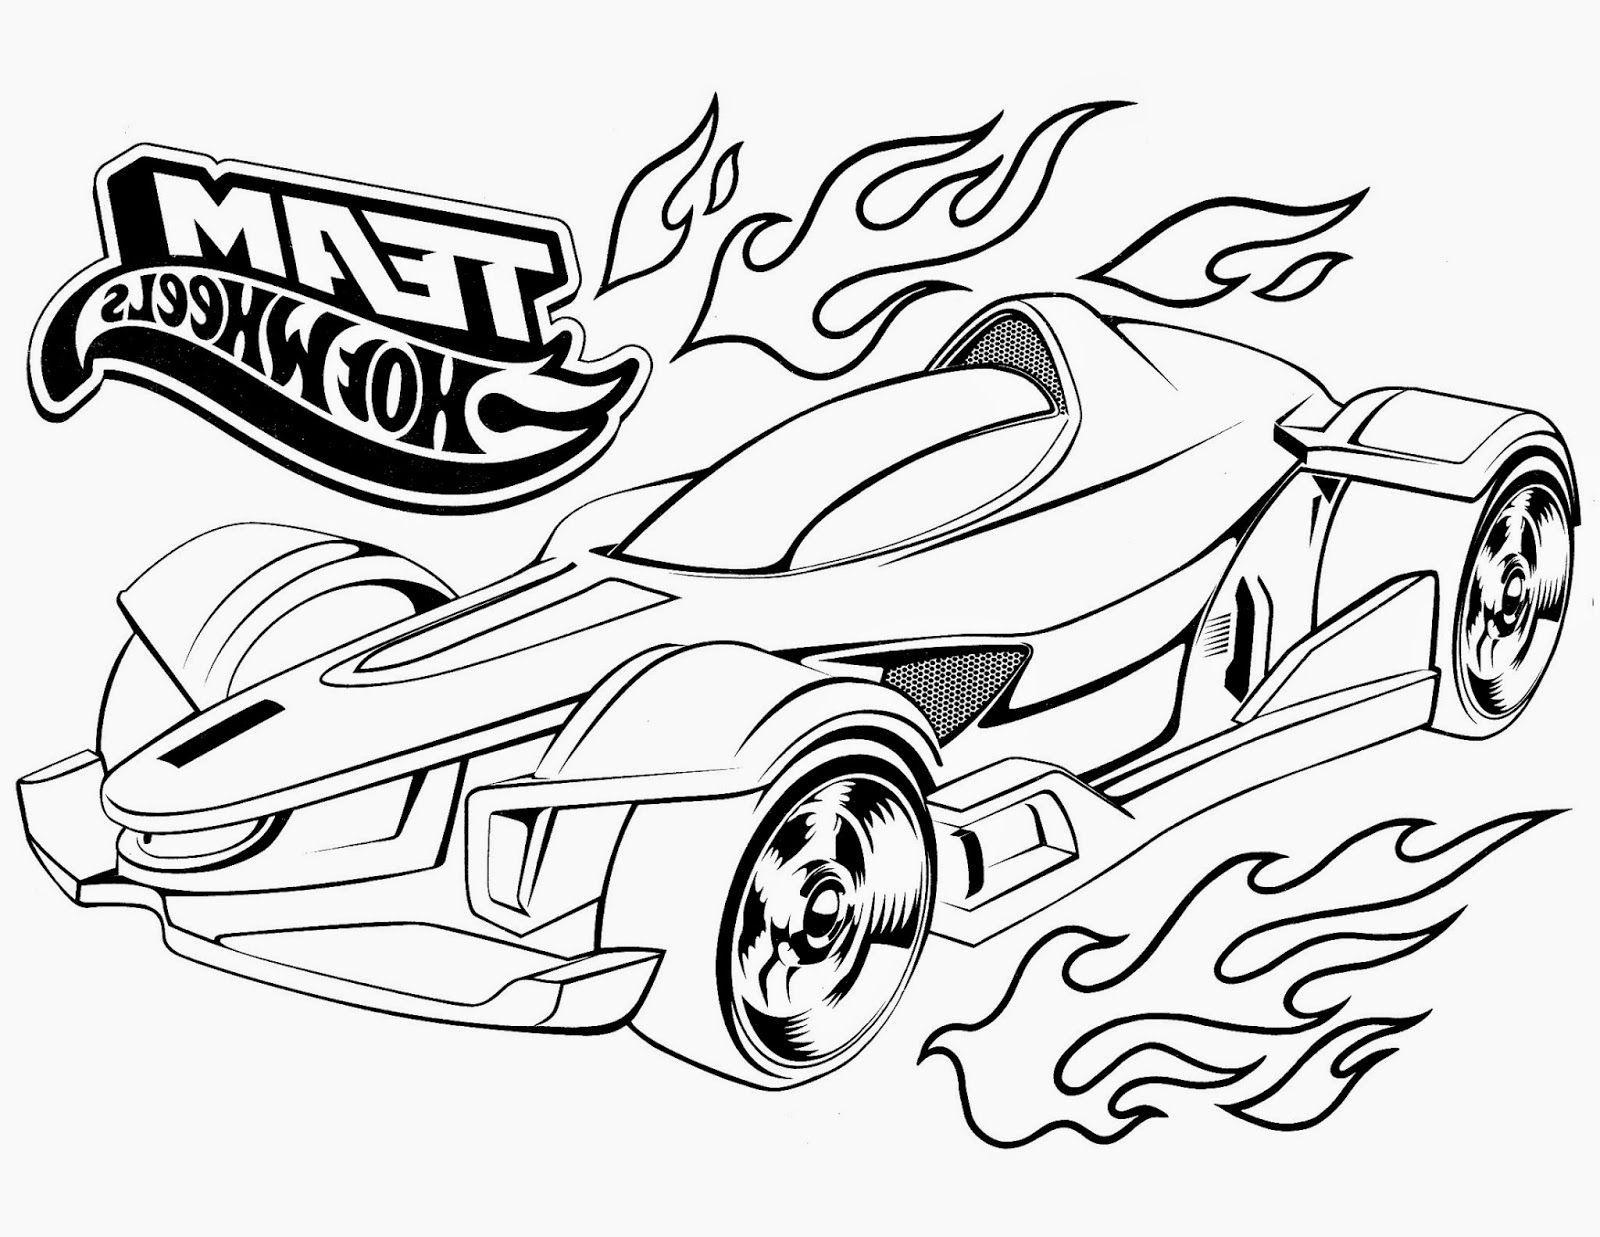 Hot Wheels Coloring Pages 9viq Hot Wheels Racing League